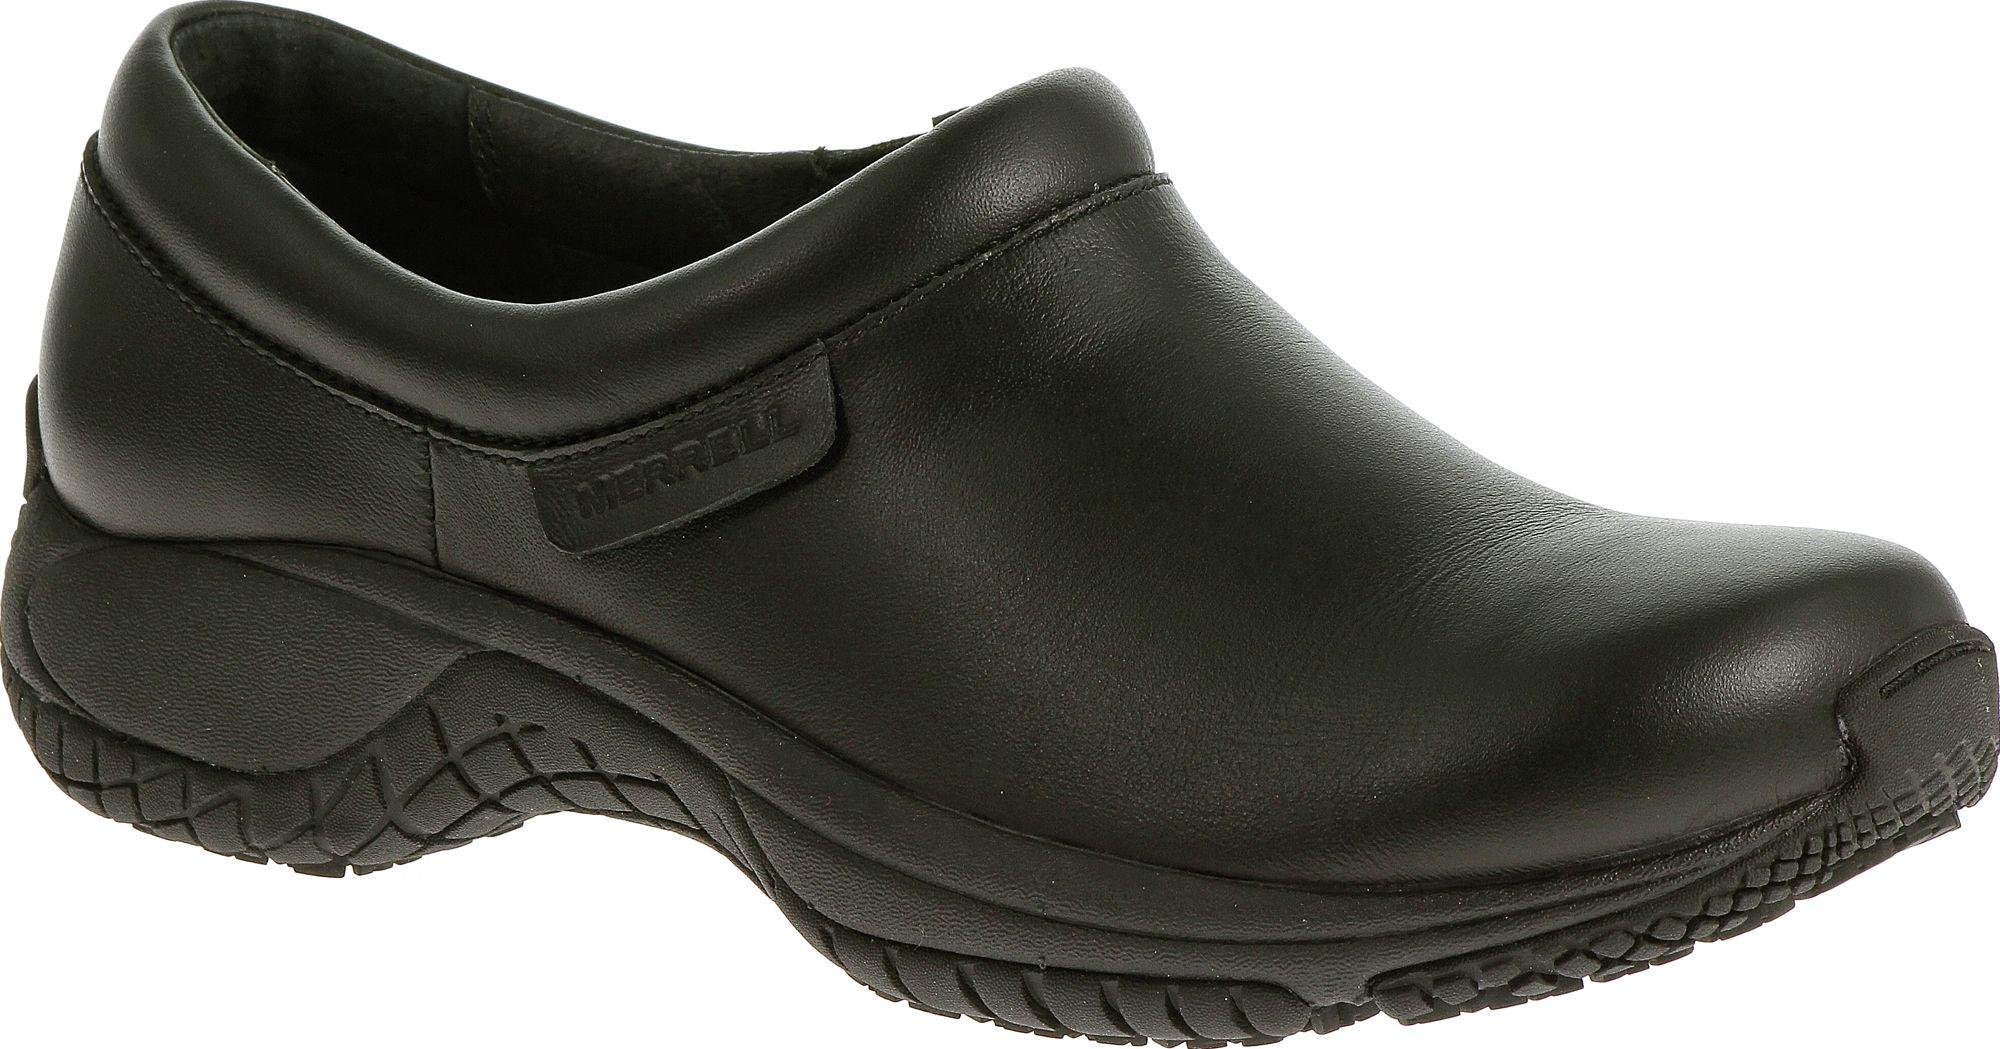 Merrell Women's Encore Moc Pro Grip Casual Shoes Boots